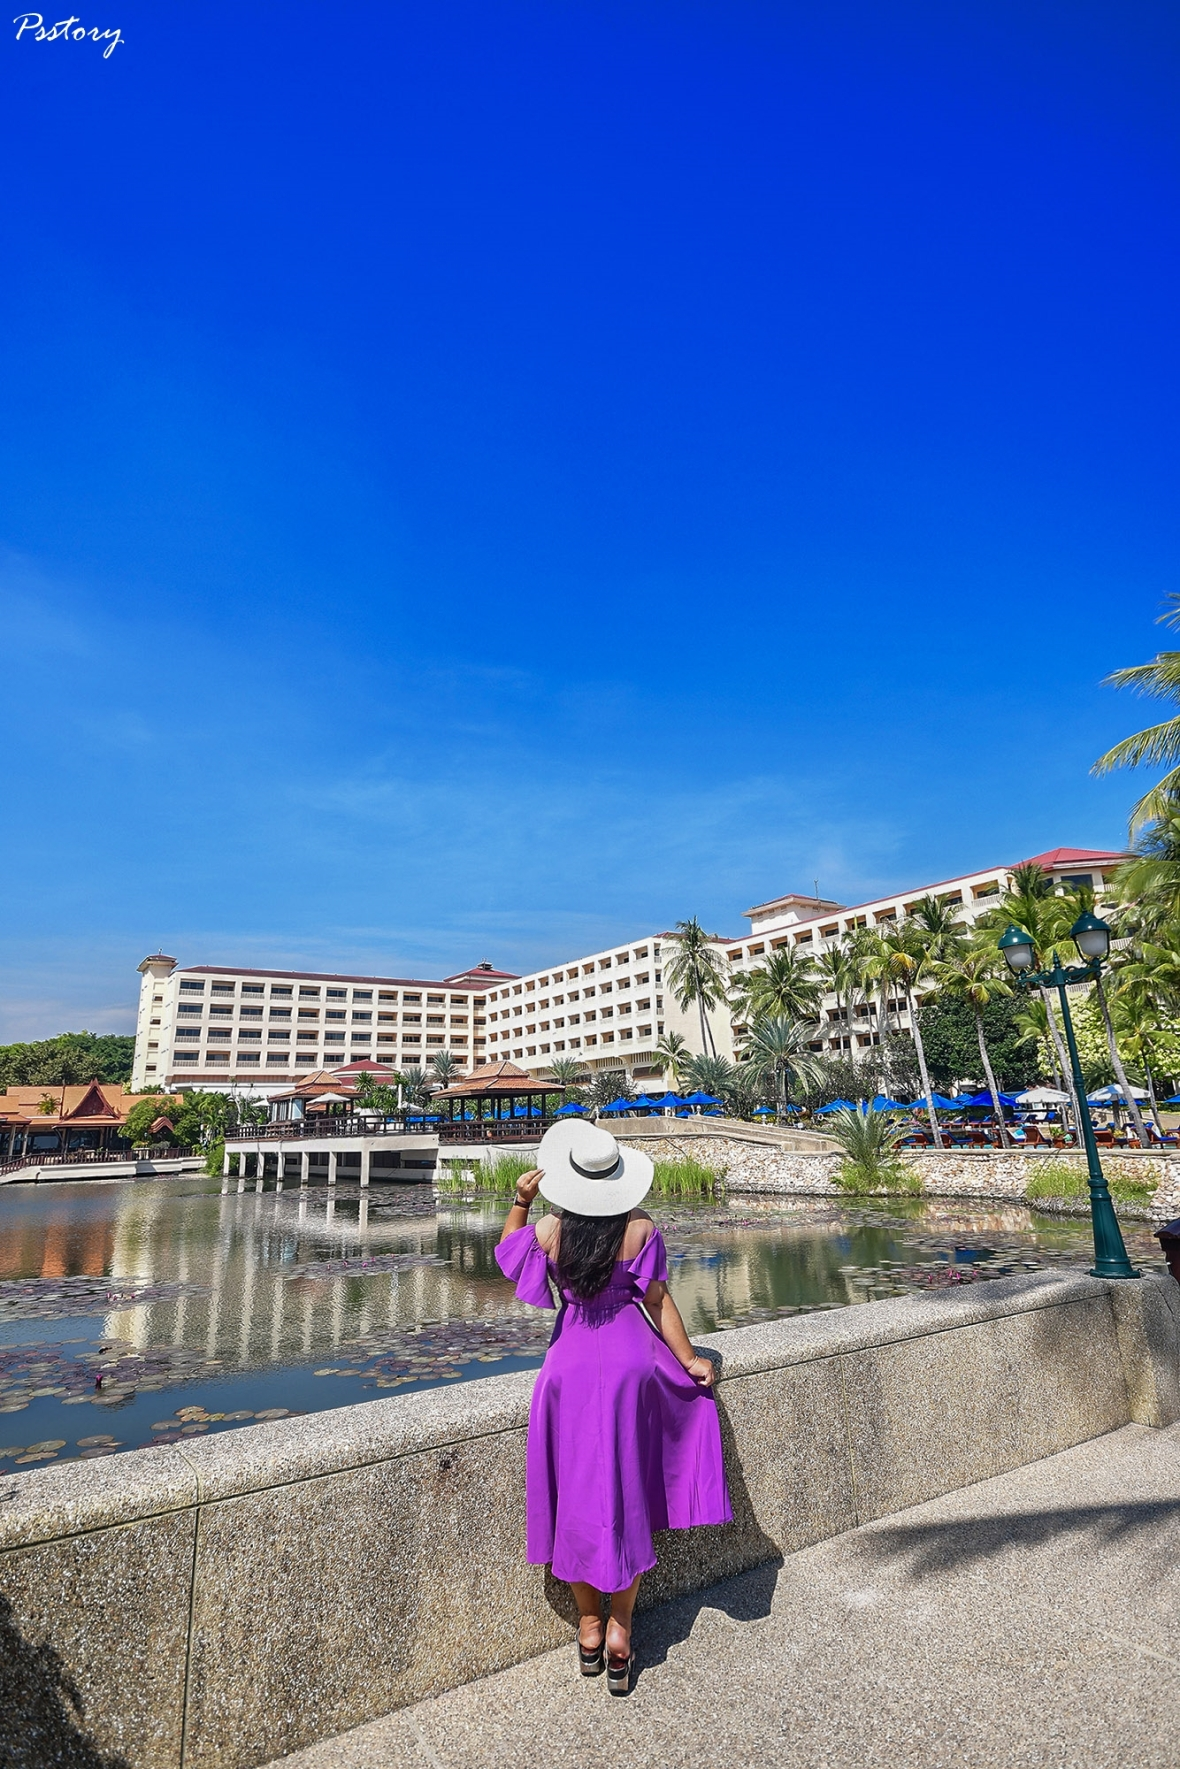 Dusit Thani Hua Hin Hotel (151)